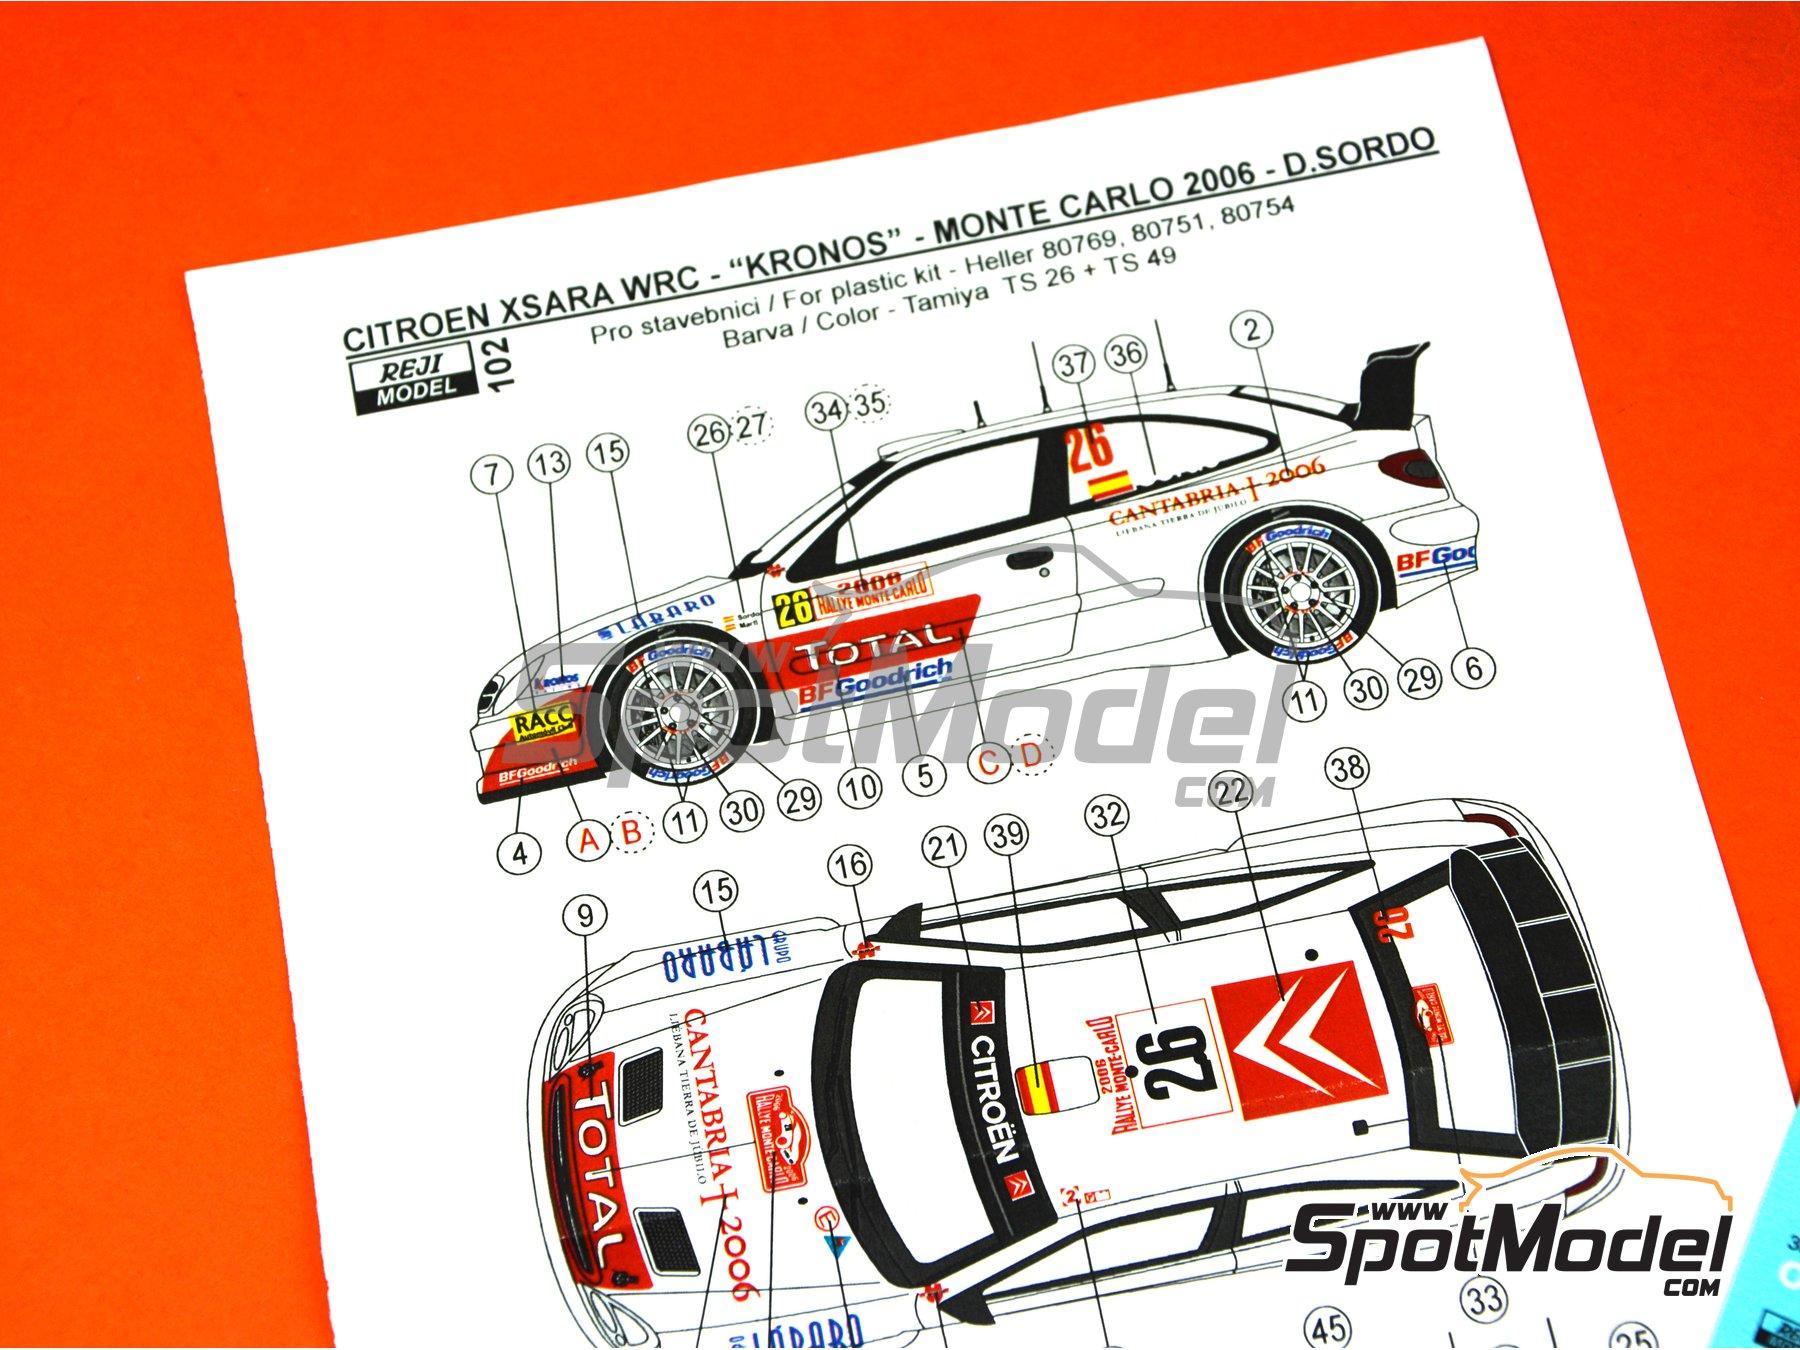 Image 7: Citroen Xsara WRC Kronos - Montecarlo Rally, Svezia Sweden Rally 2006 | Marking / livery in 1/24 scale manufactured by Reji Model (ref.REJI-102)